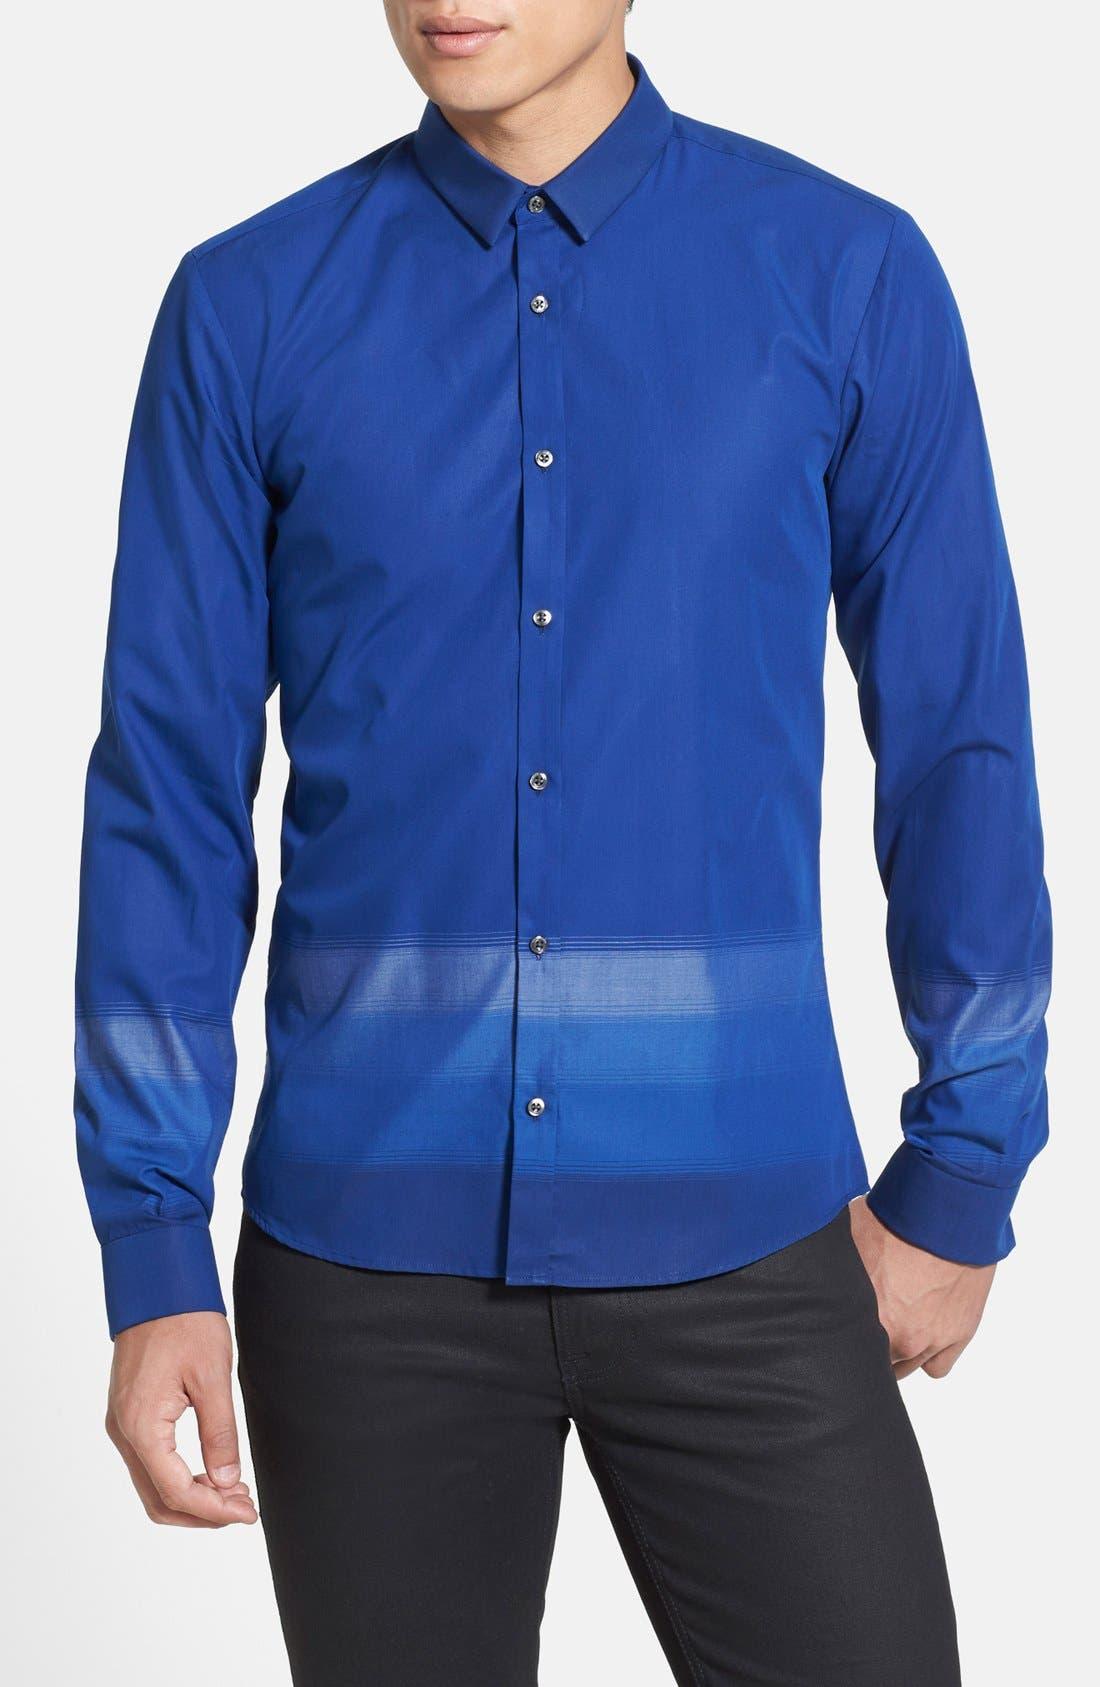 Alternate Image 1 Selected - HUGO 'Ero' Extra Trim Fit Ombré Stripe Sport Shirt